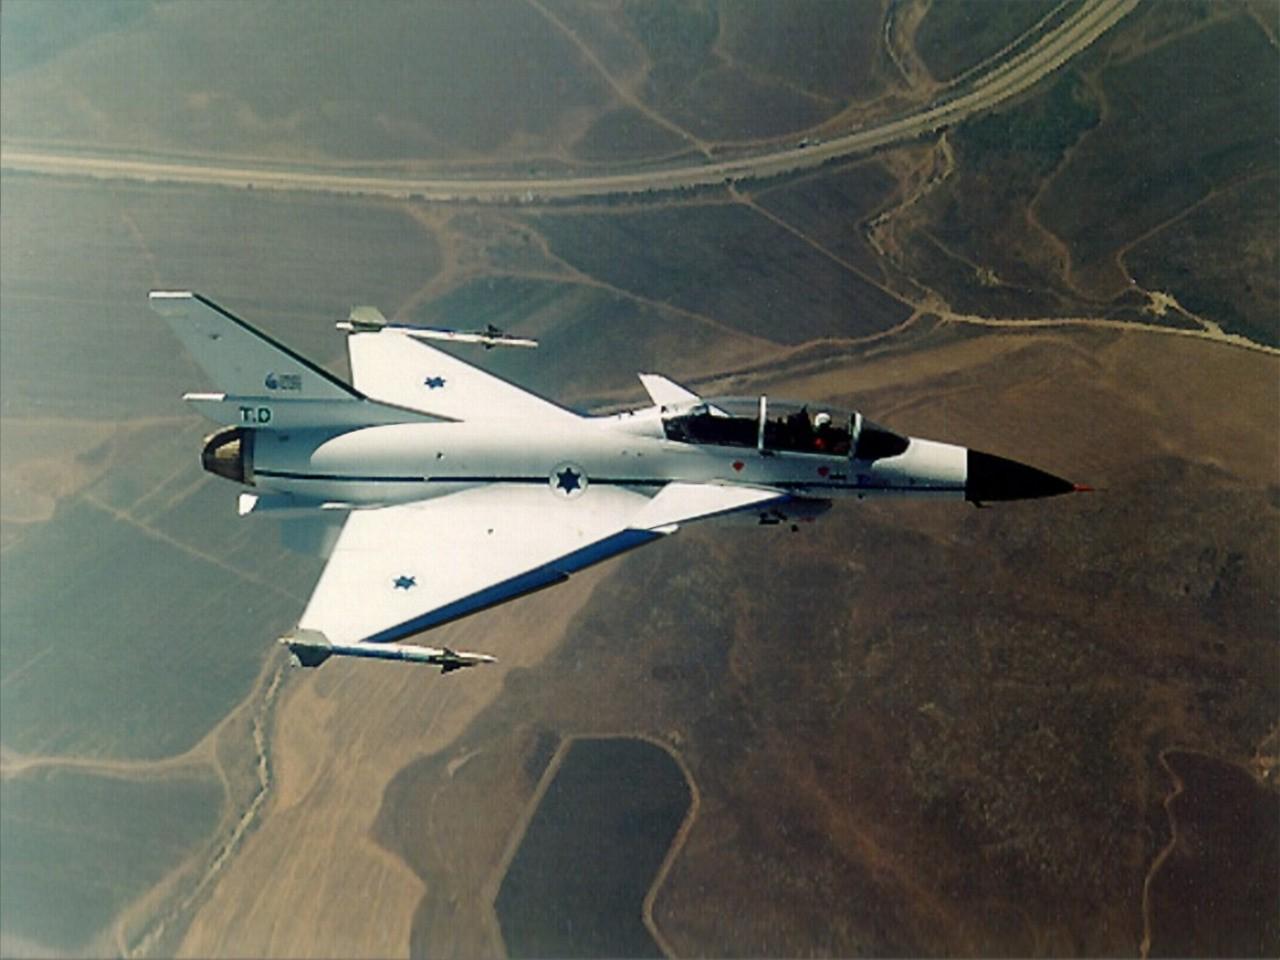 ( J-10 Vigorous Dragon ( F-10 Vanguard  Iai_lavi_atd_flight-01